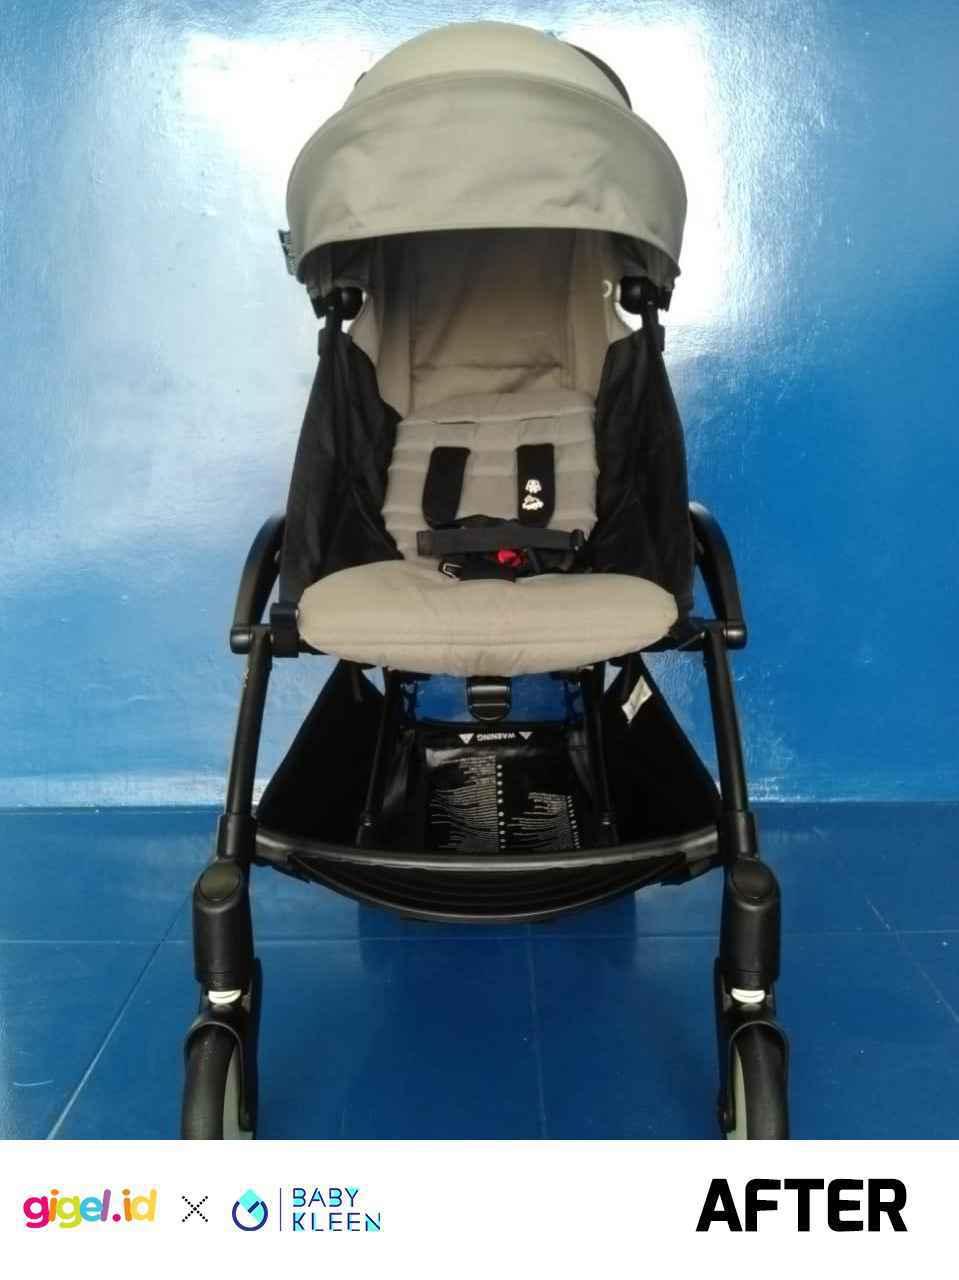 GIGEL.ID x Baby Kleen Laundry Stroller - 2